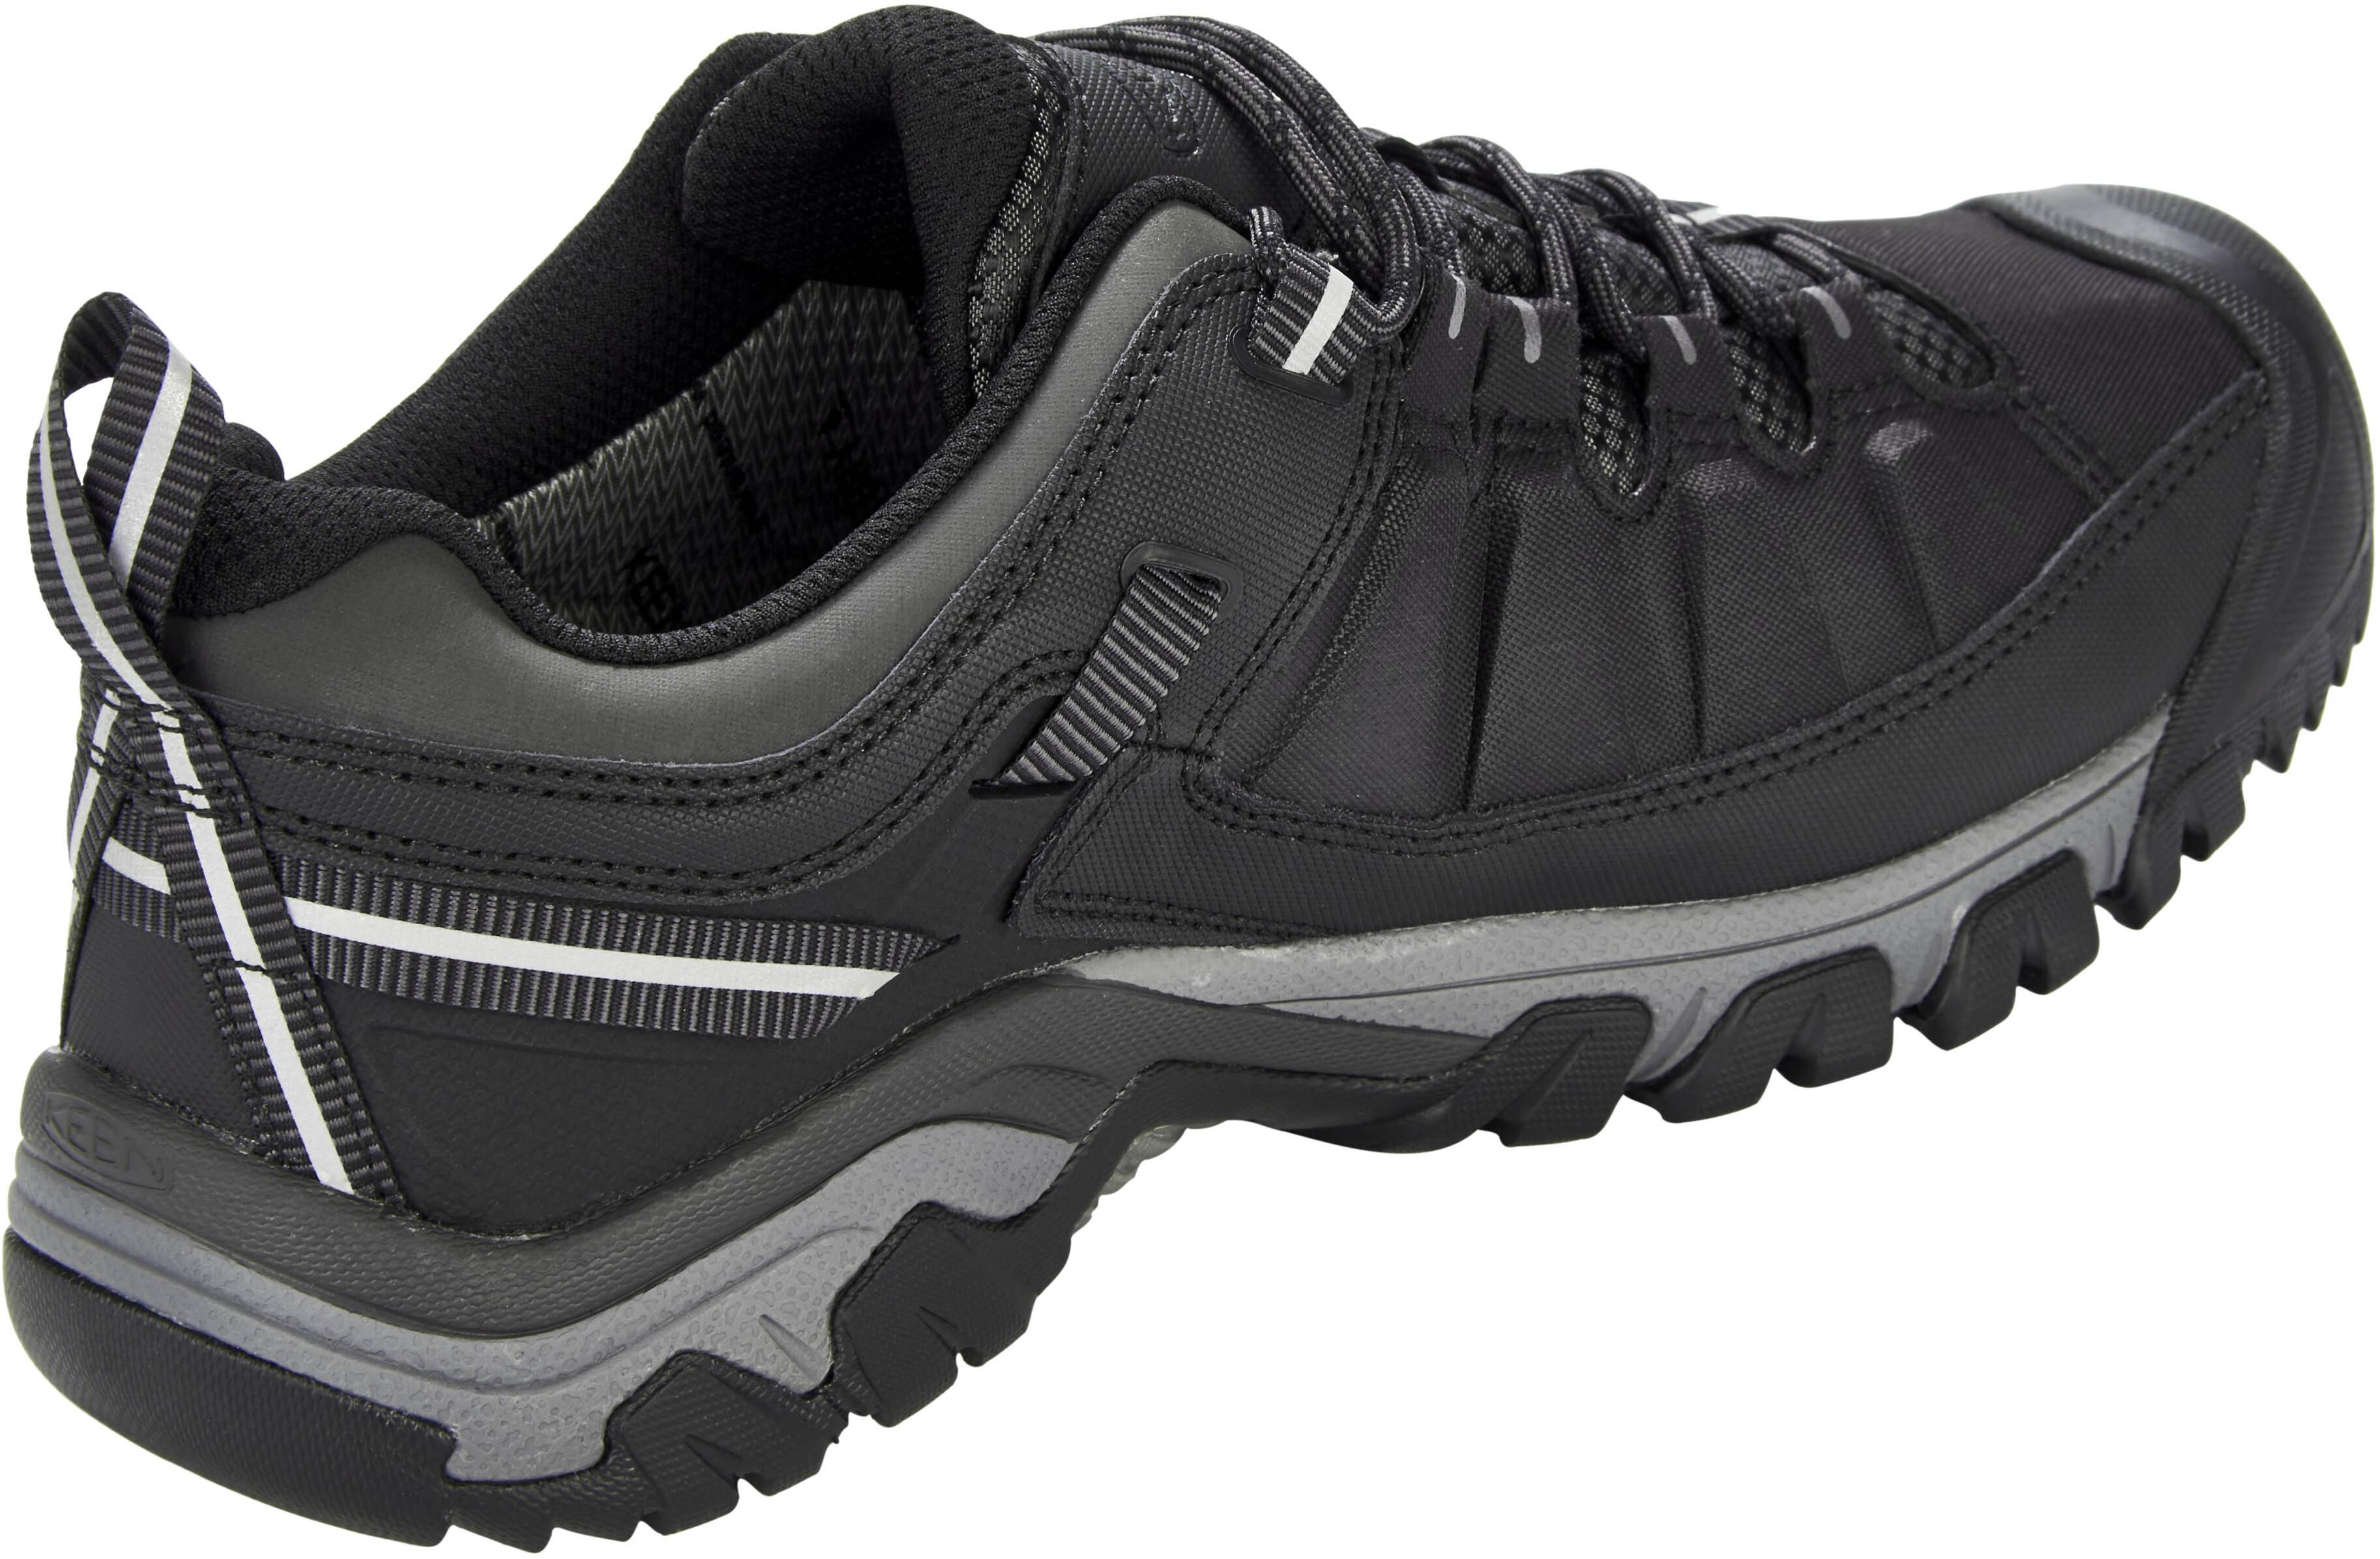 Black Diamond Aspect Shoe Review